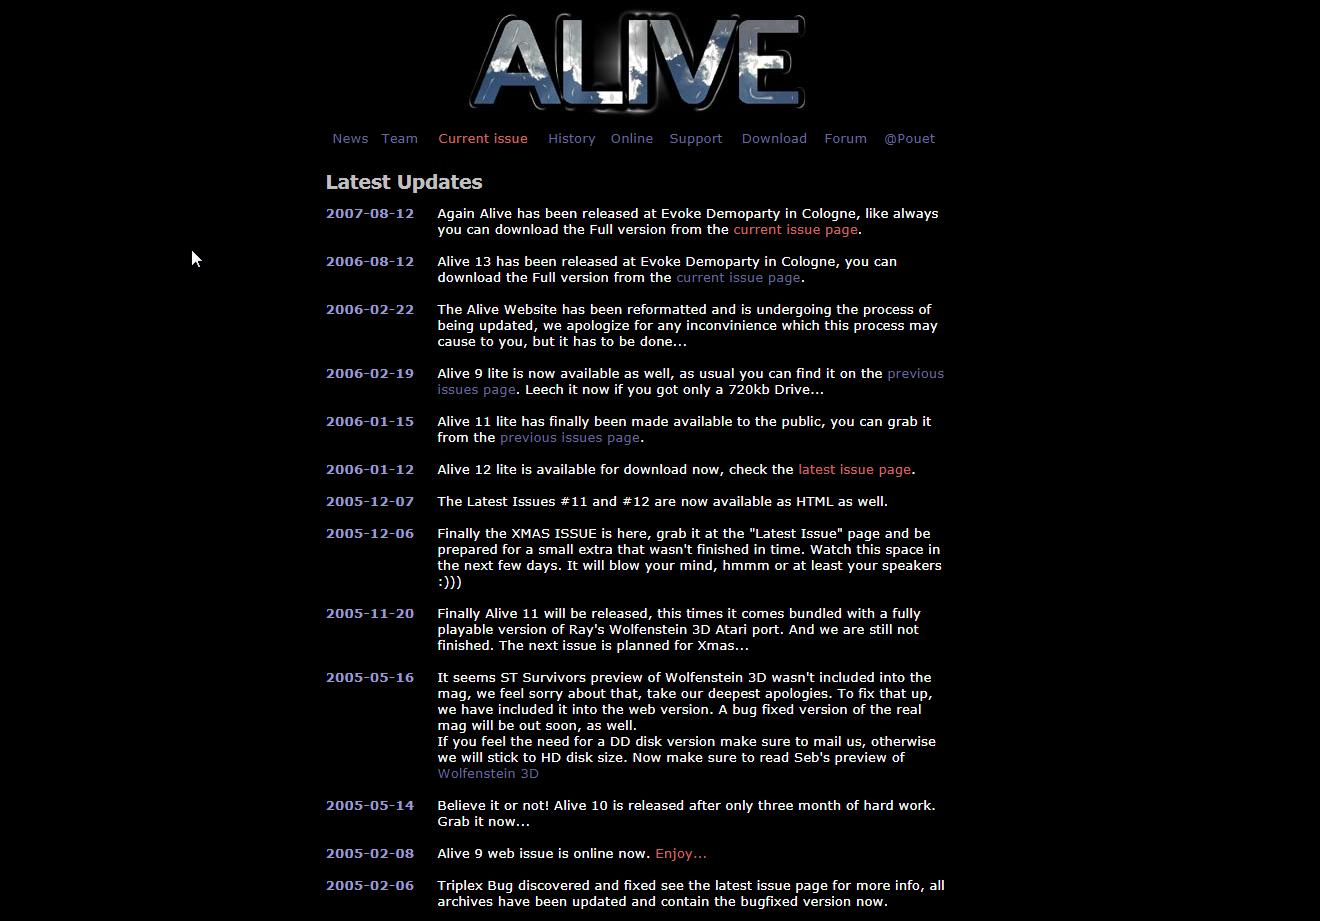 Screenshot of website Alive HQ